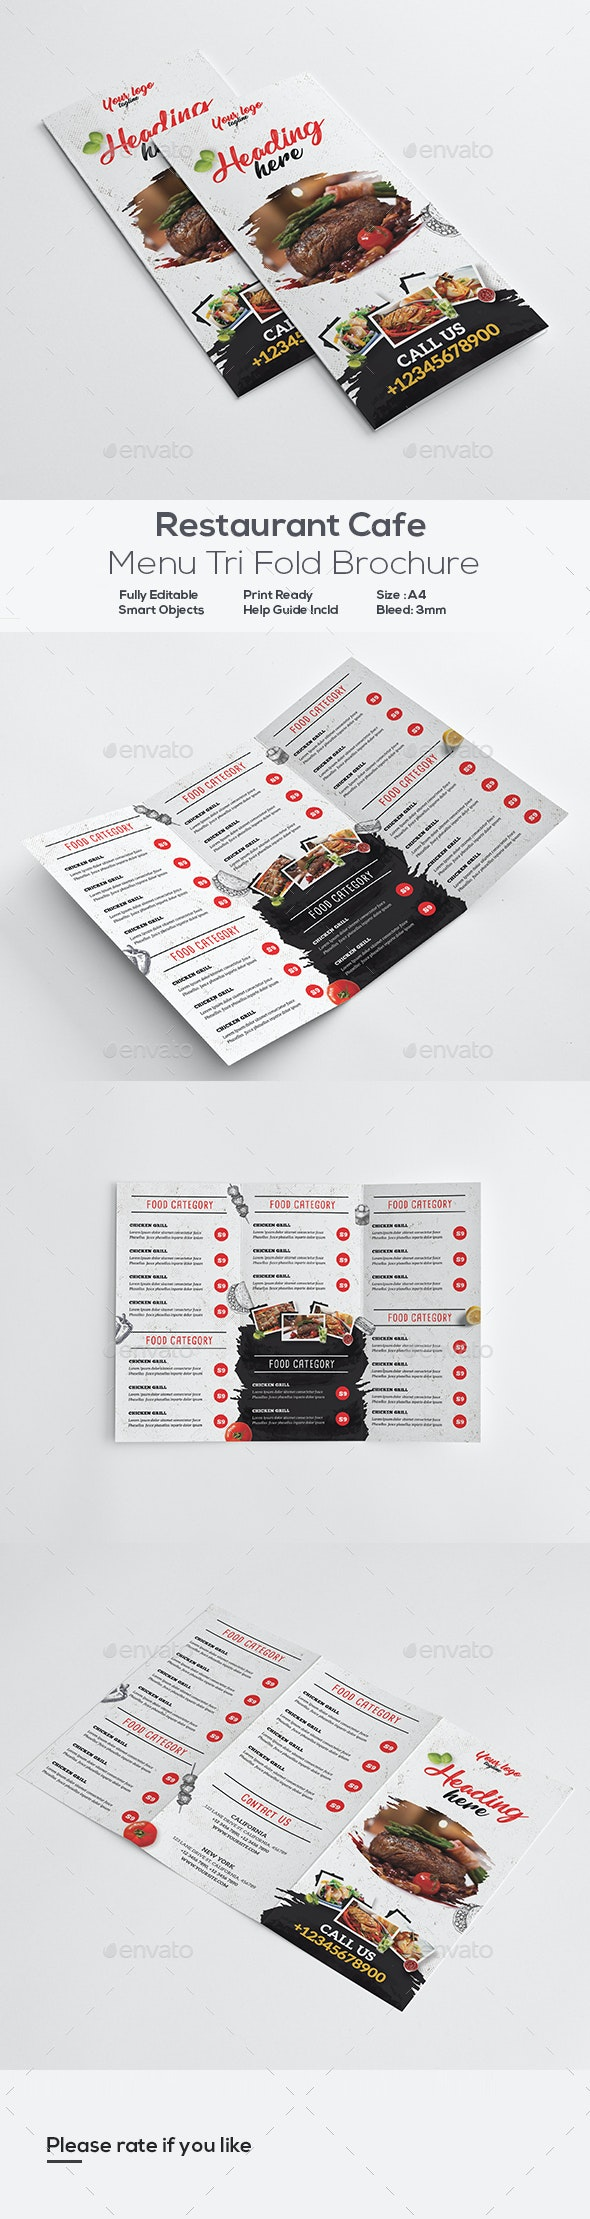 Restaurant Menu Trifold Brochure - Food Menus Print Templates